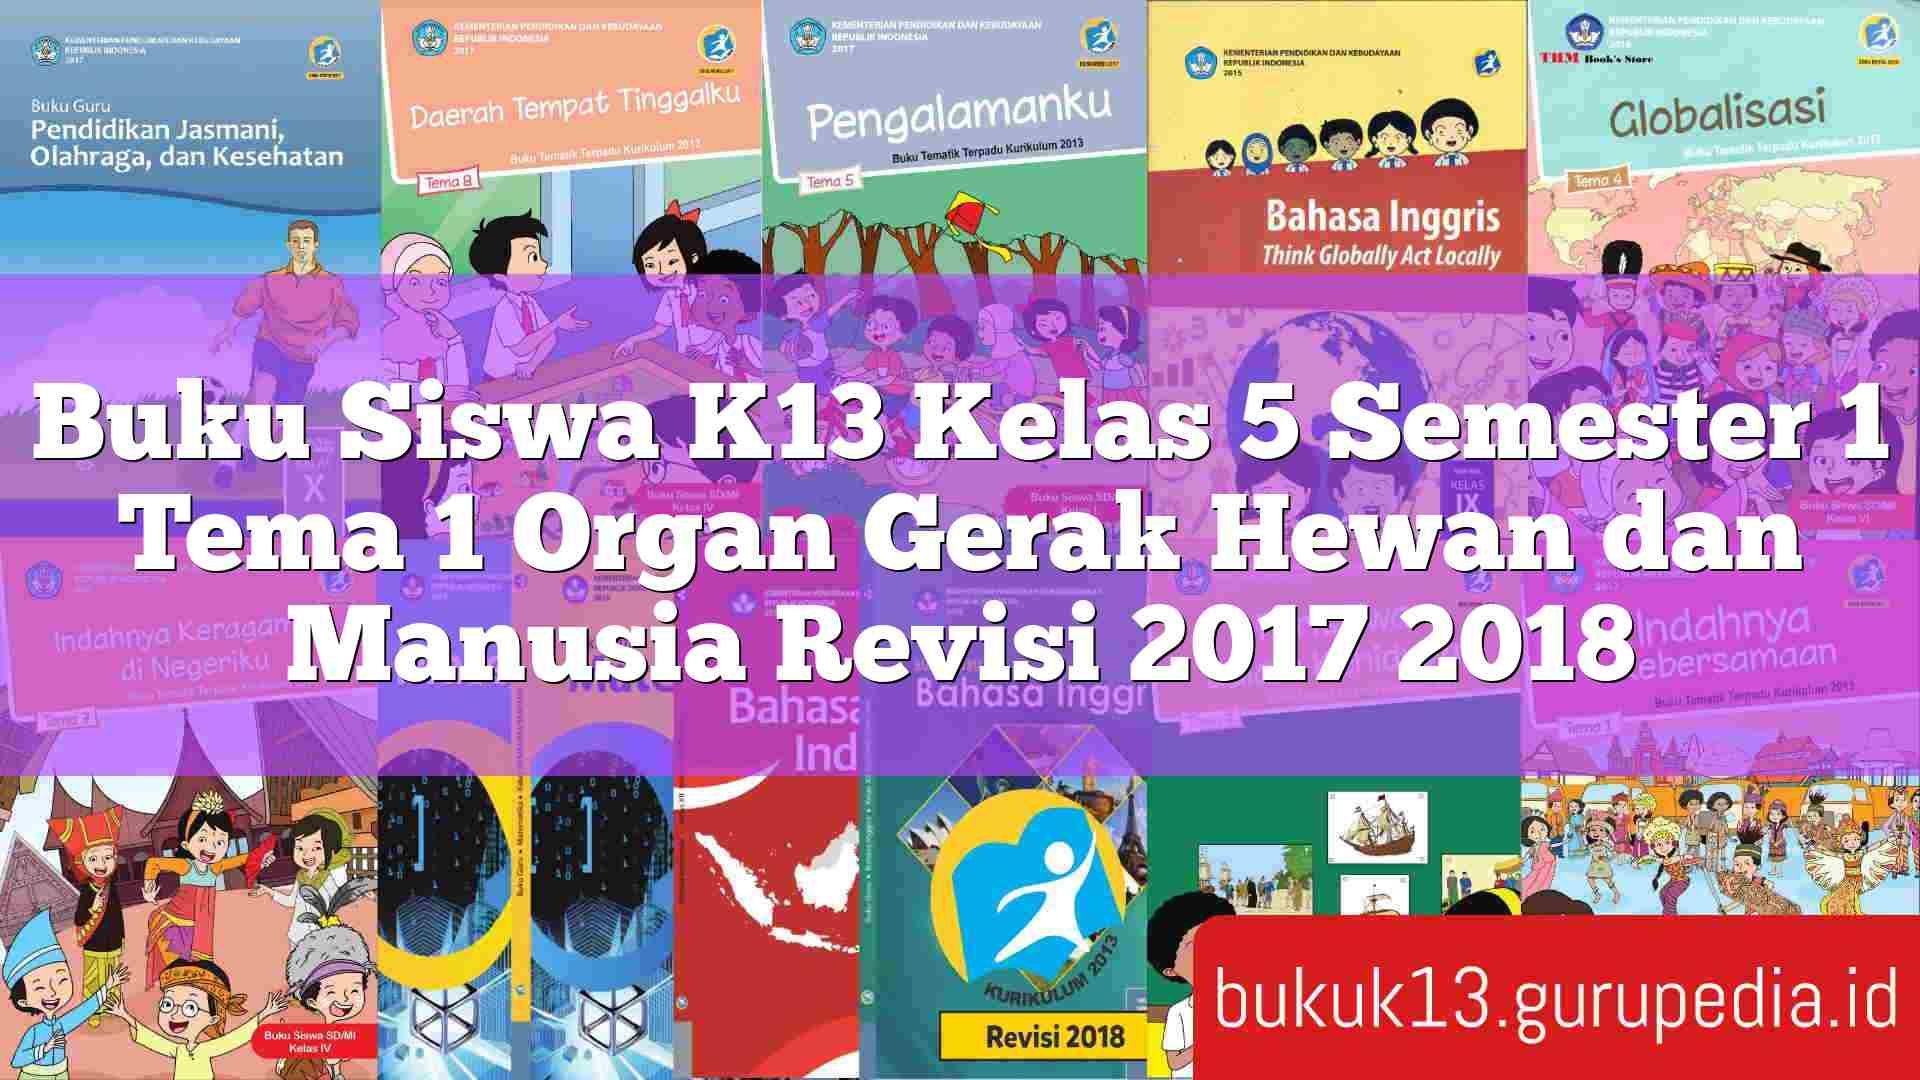 Buku Siswa K13 Kelas 5 Semester 1 Tema 1 Organ Gerak Hewan Dan Manusia Revisi 2017 2018 Buku Guru Kepemimpinan